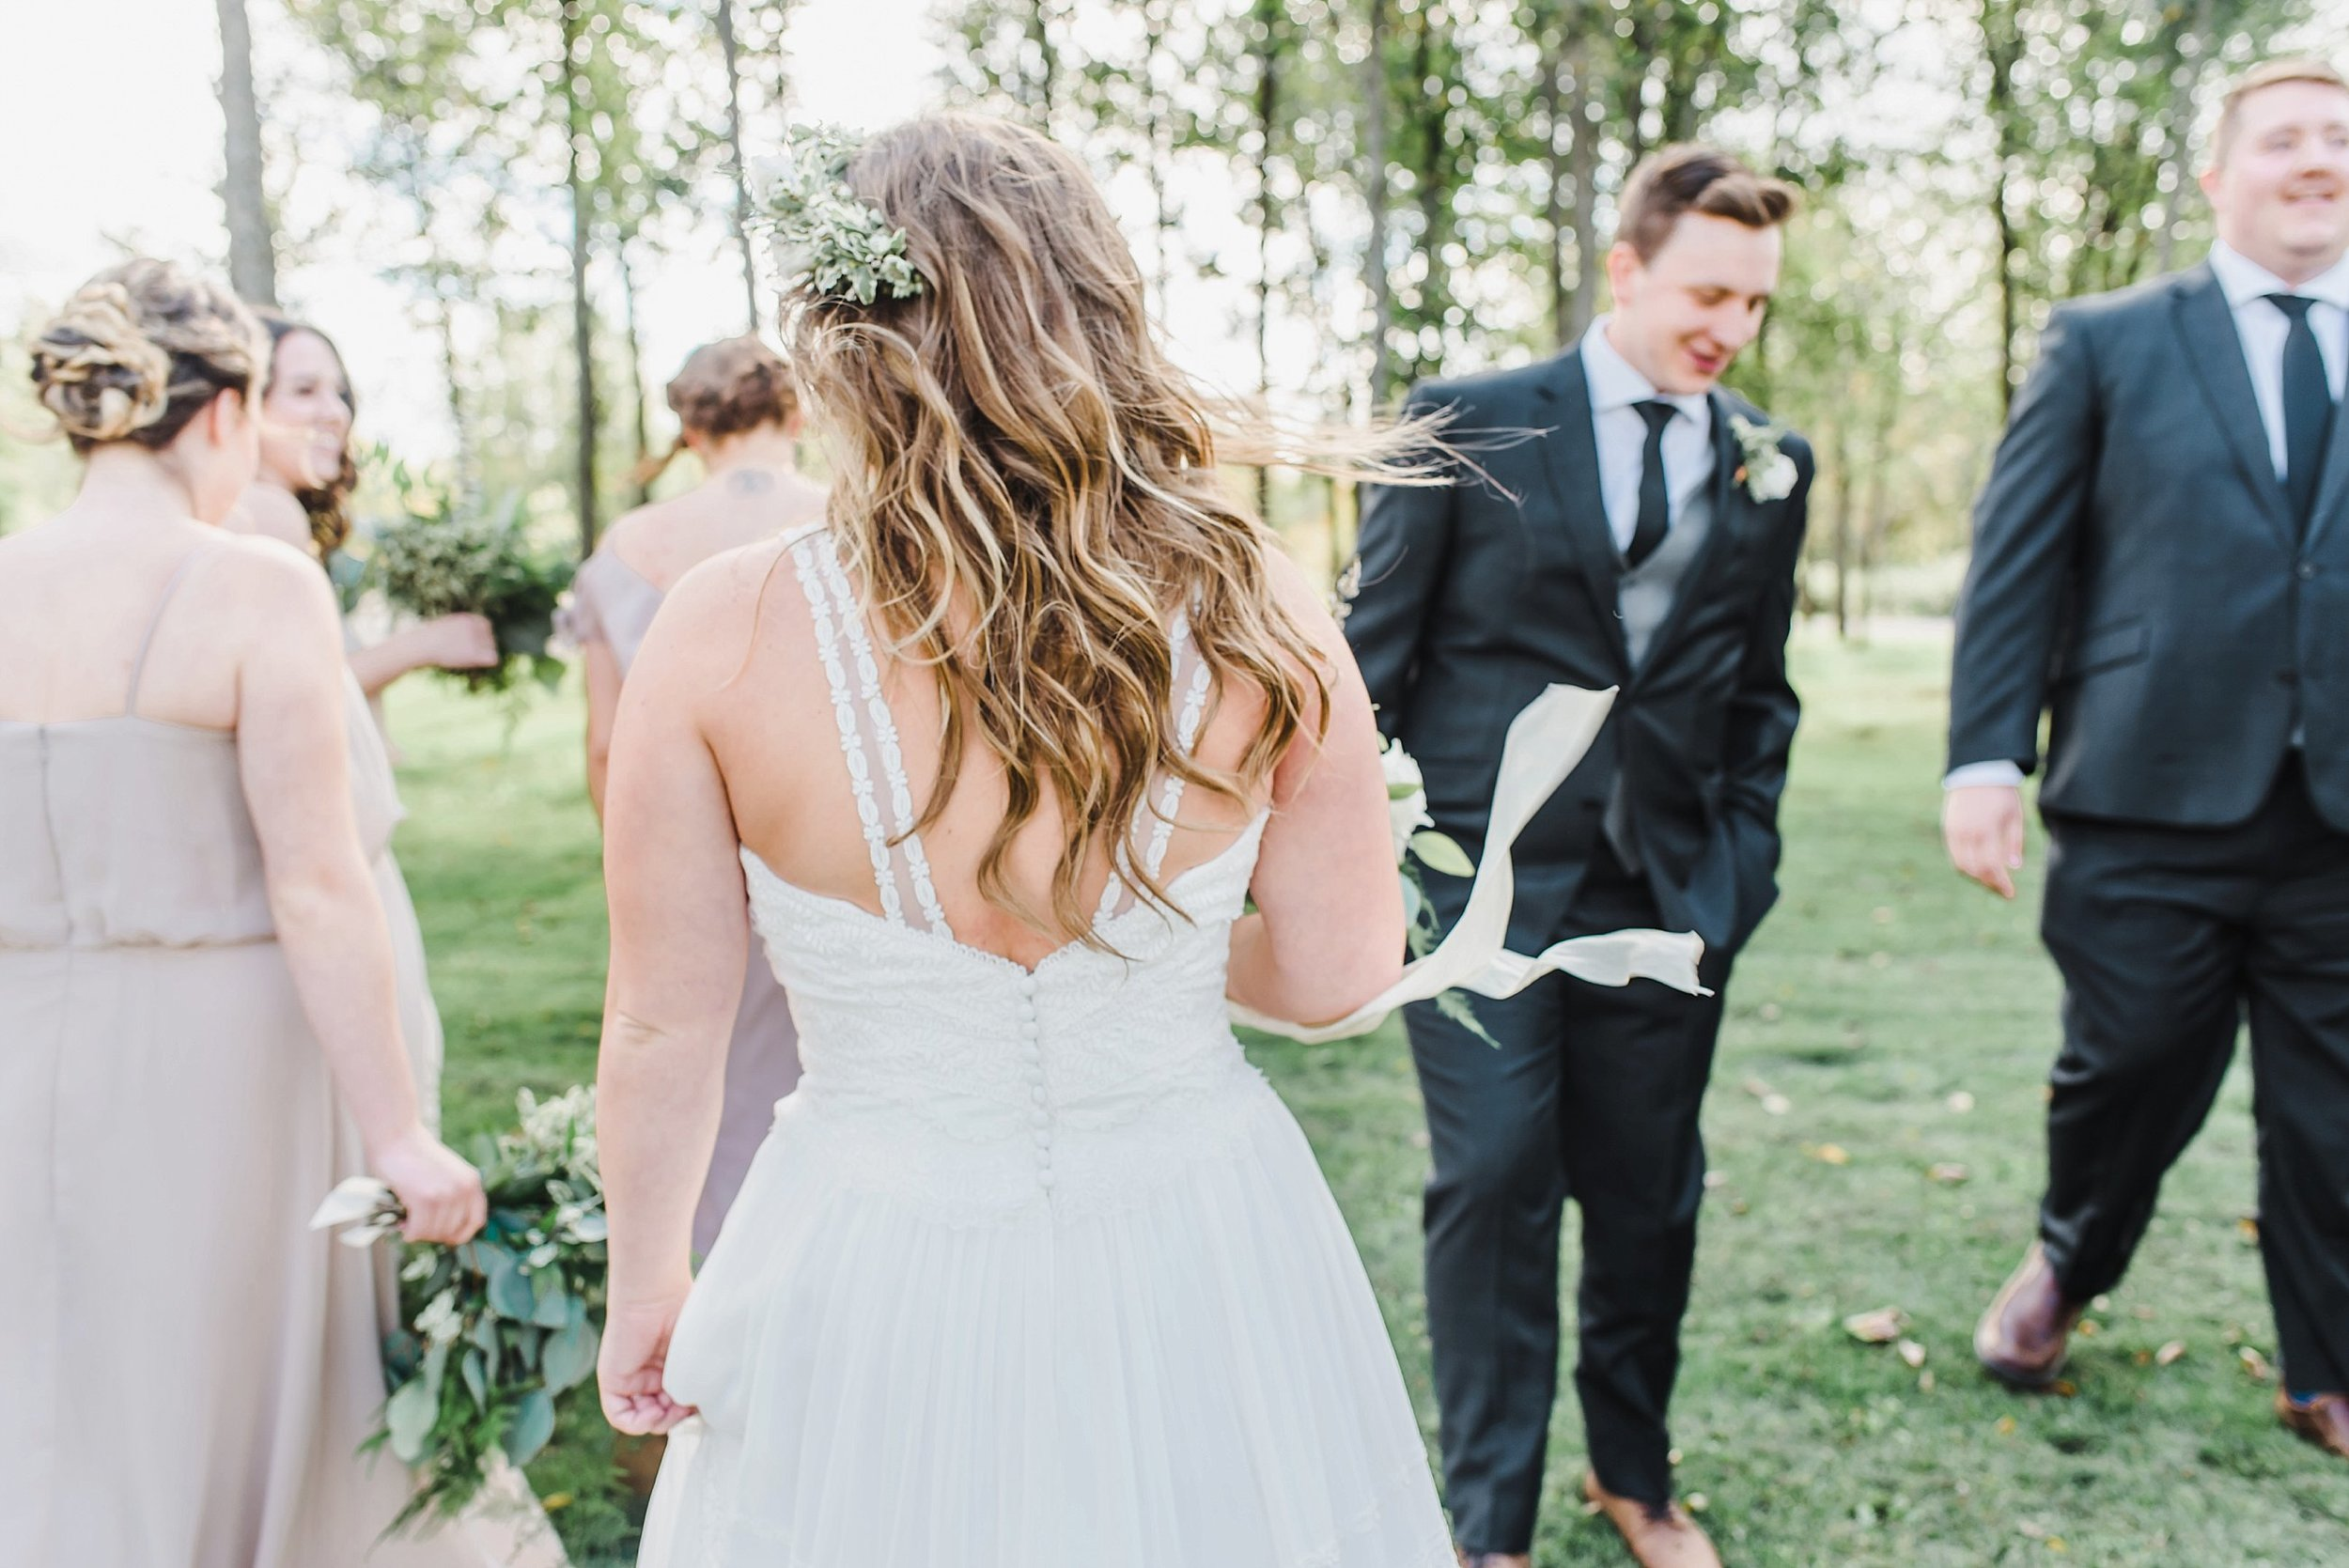 light airy indie fine art ottawa wedding photographer | Ali and Batoul Photography_1128.jpg